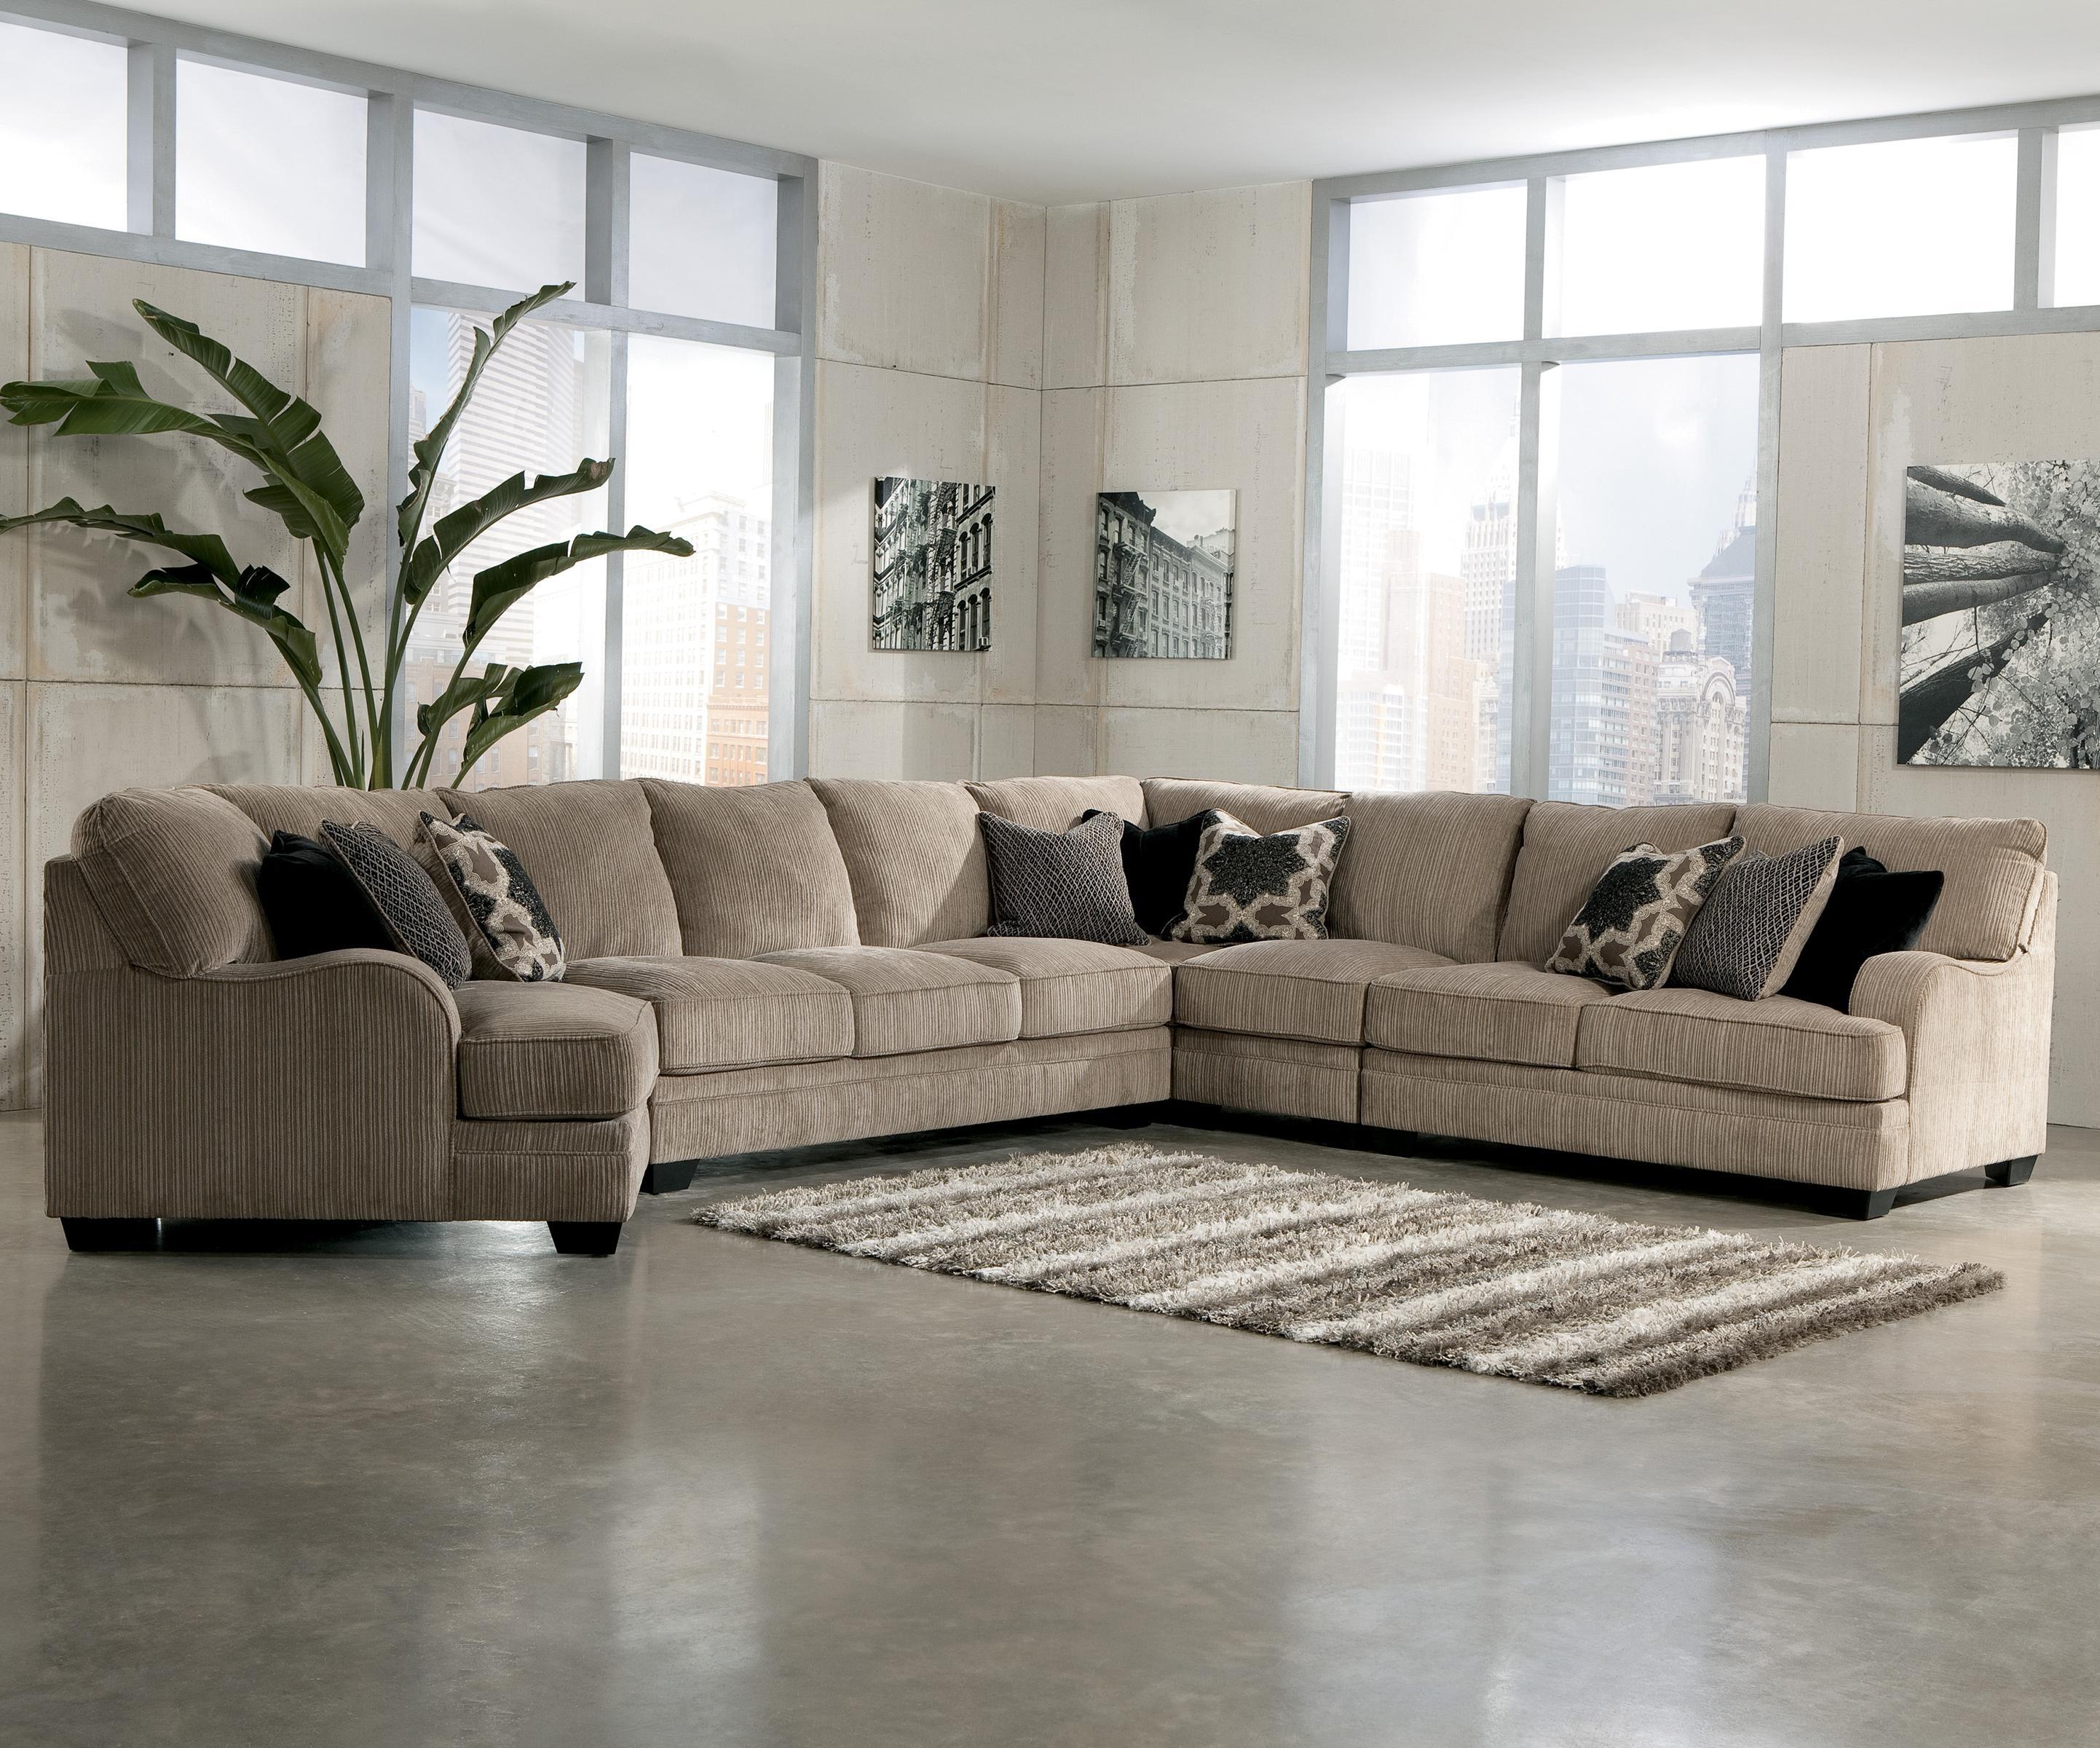 Signature Designashley Katisha - Platinum 5-Piece Sectional Sofa regarding Blaine 4 Piece Sectionals (Image 27 of 30)